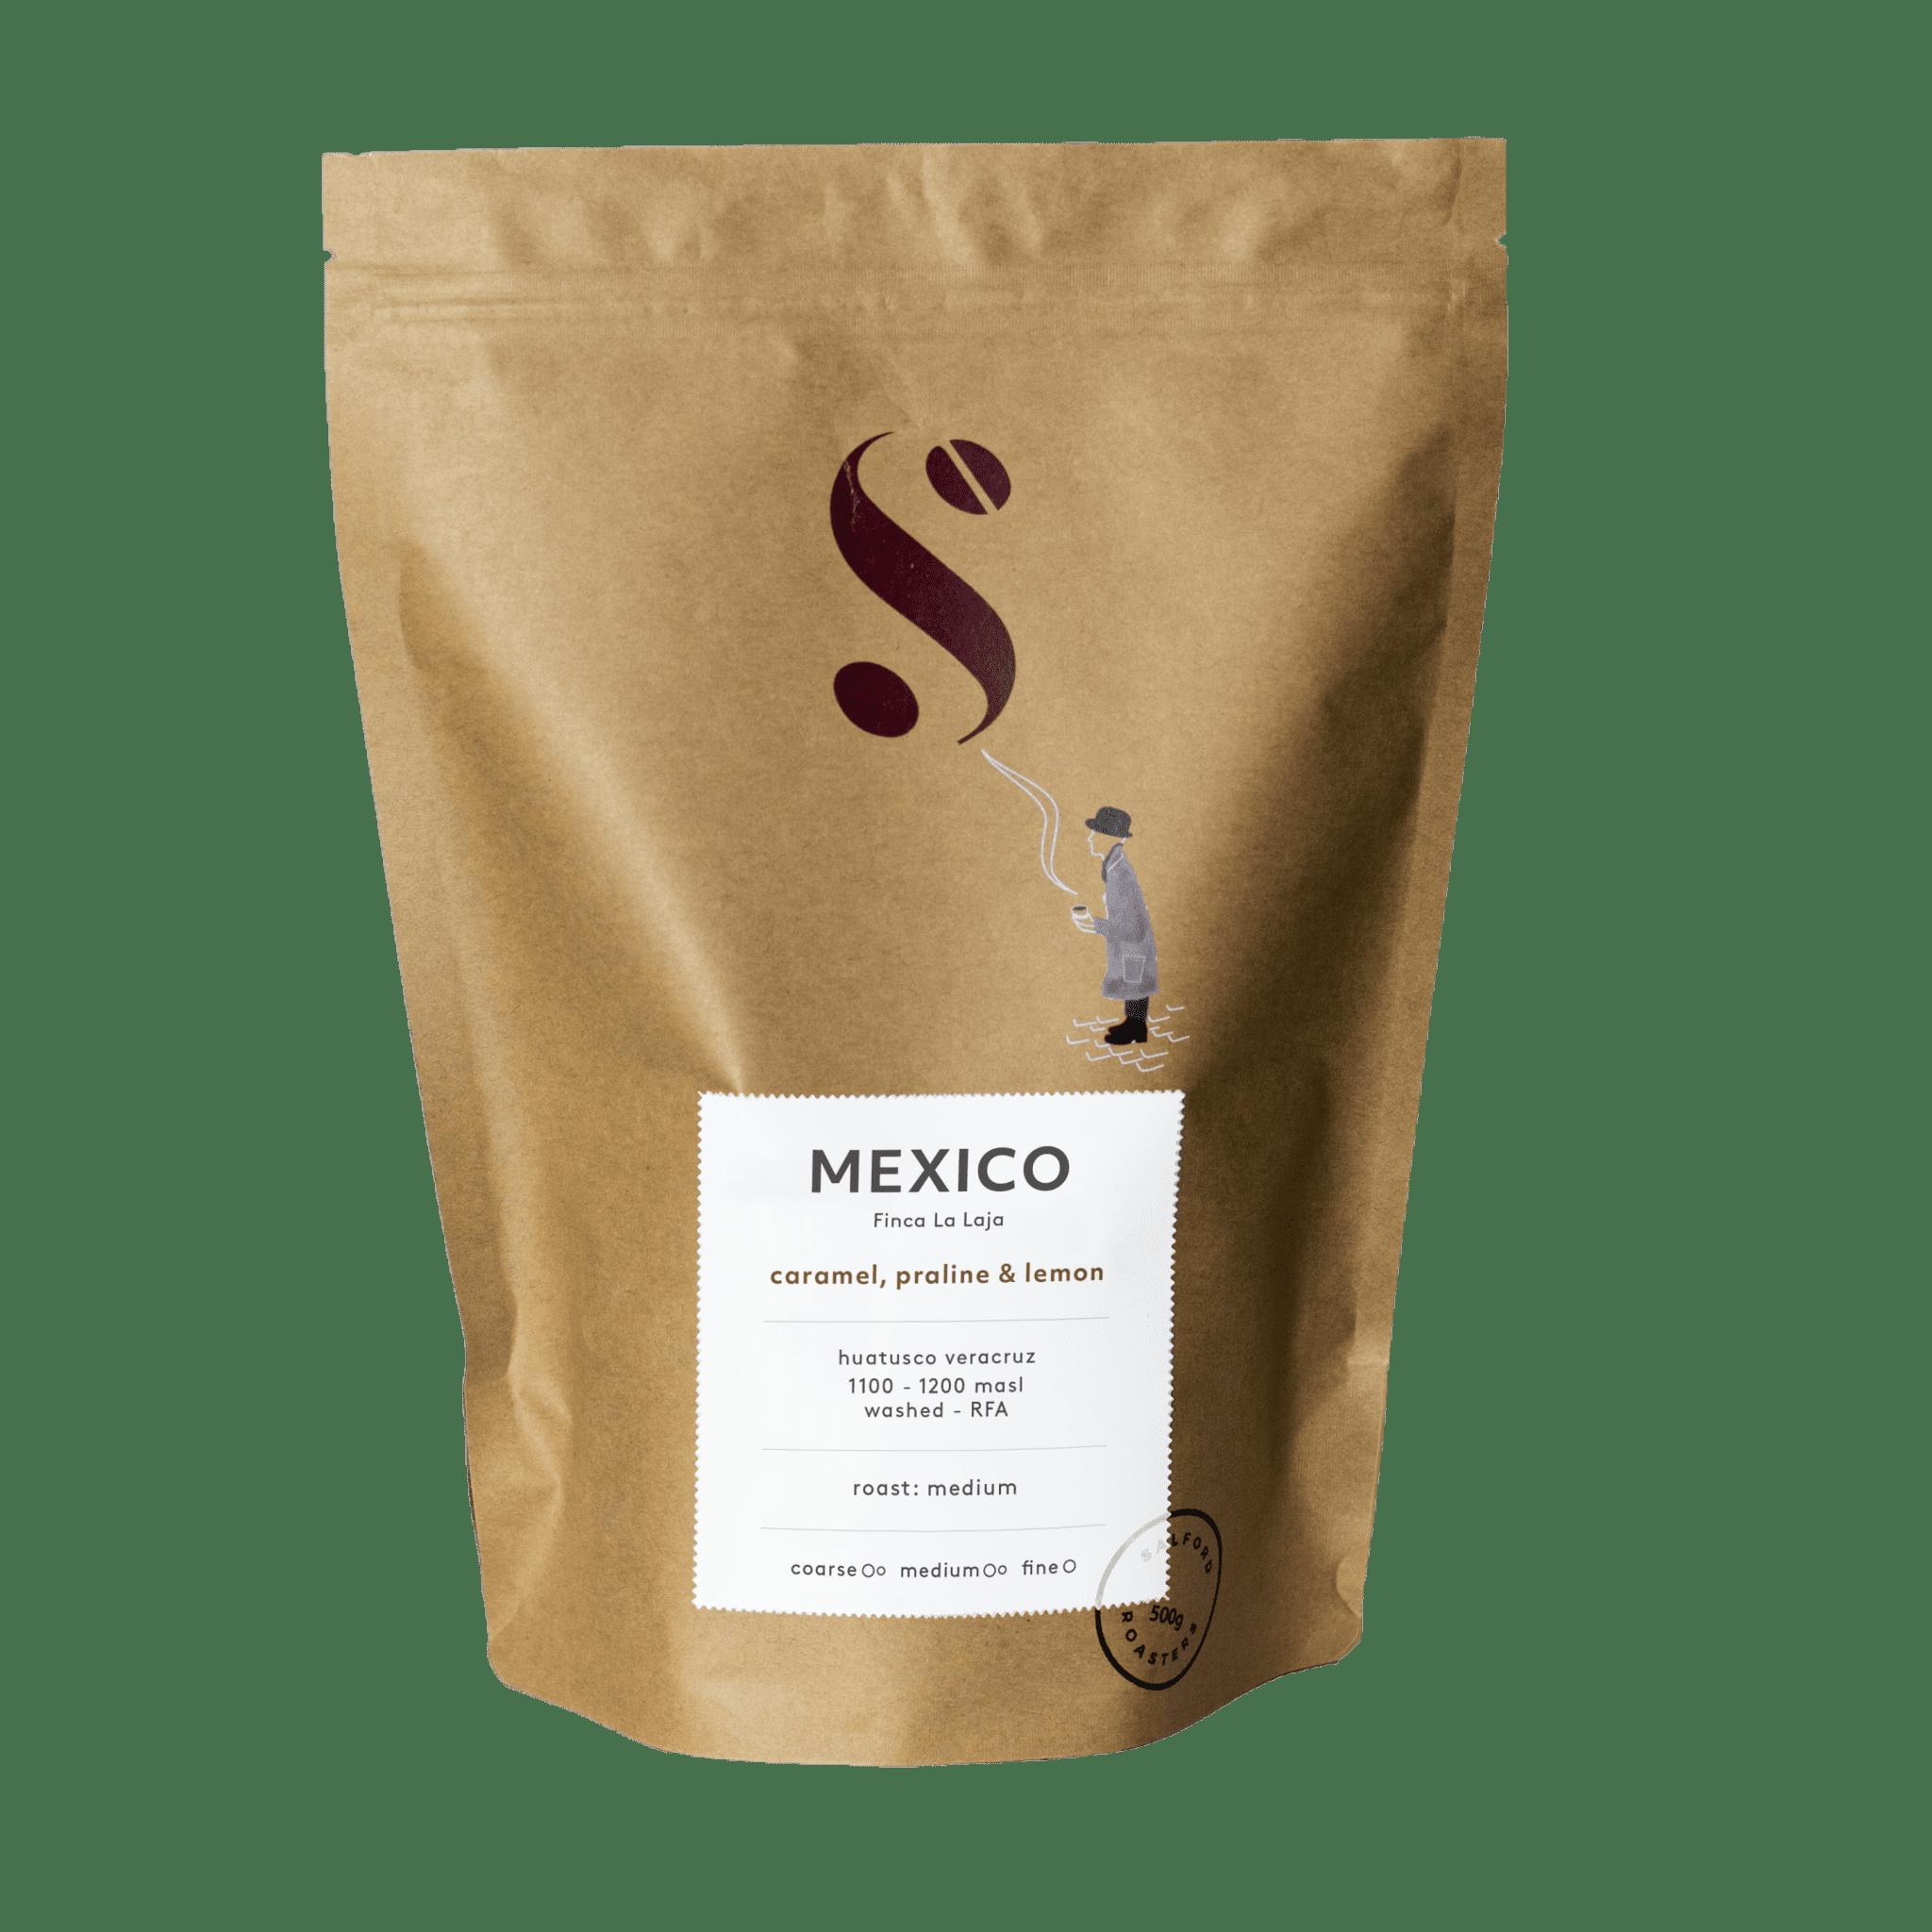 Mexico Coffee Salford